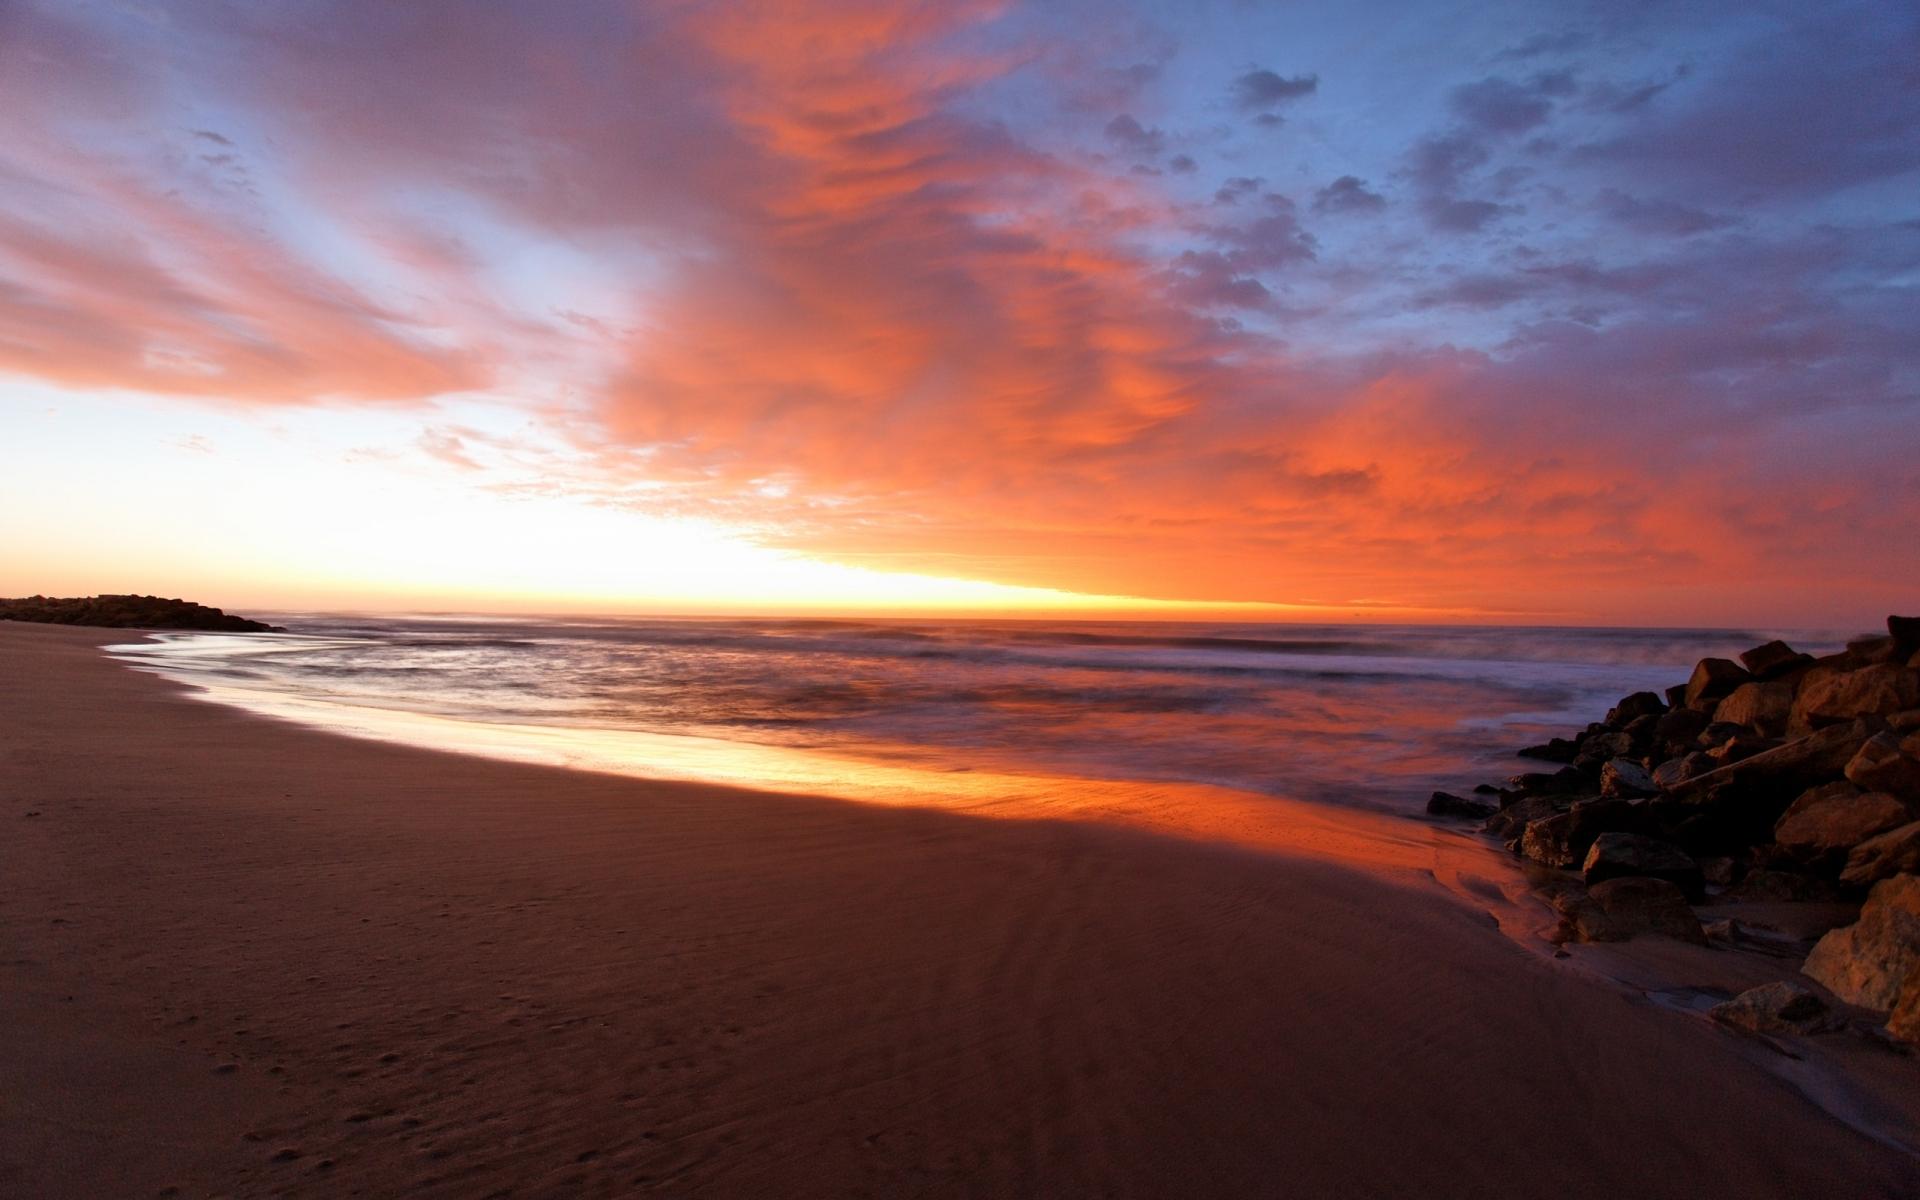 Amanecer en la playa wallpaper 886833 - Playa wallpaper ...